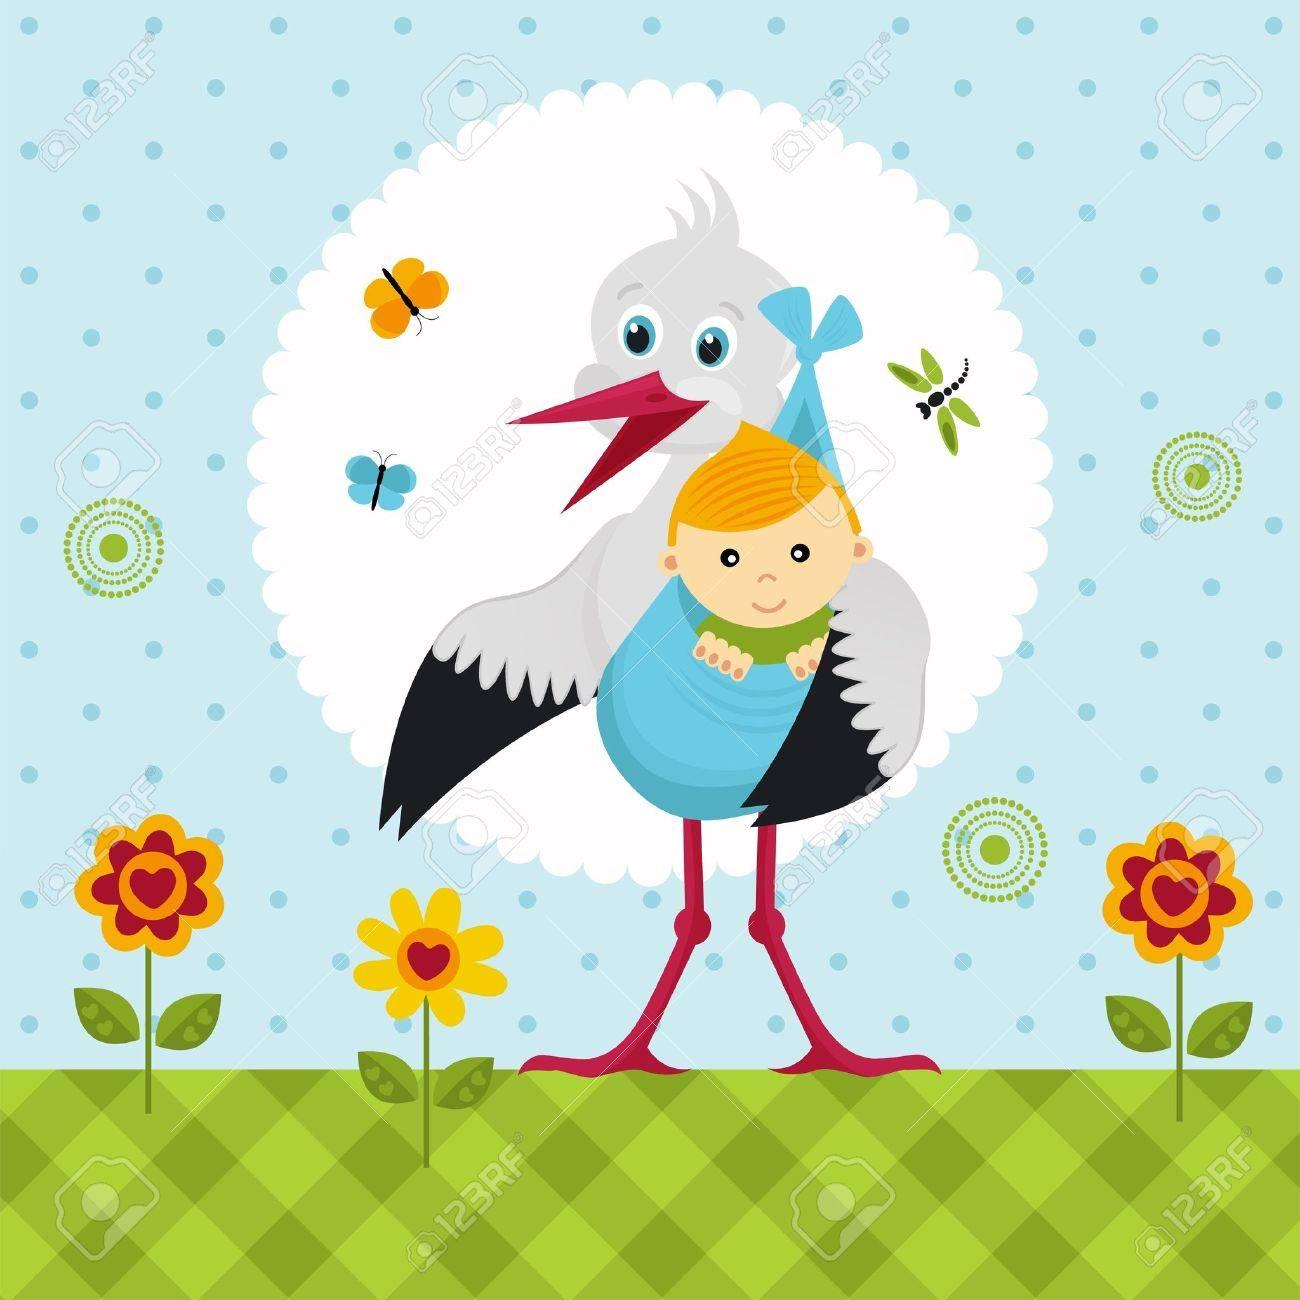 с аистом и ребенком